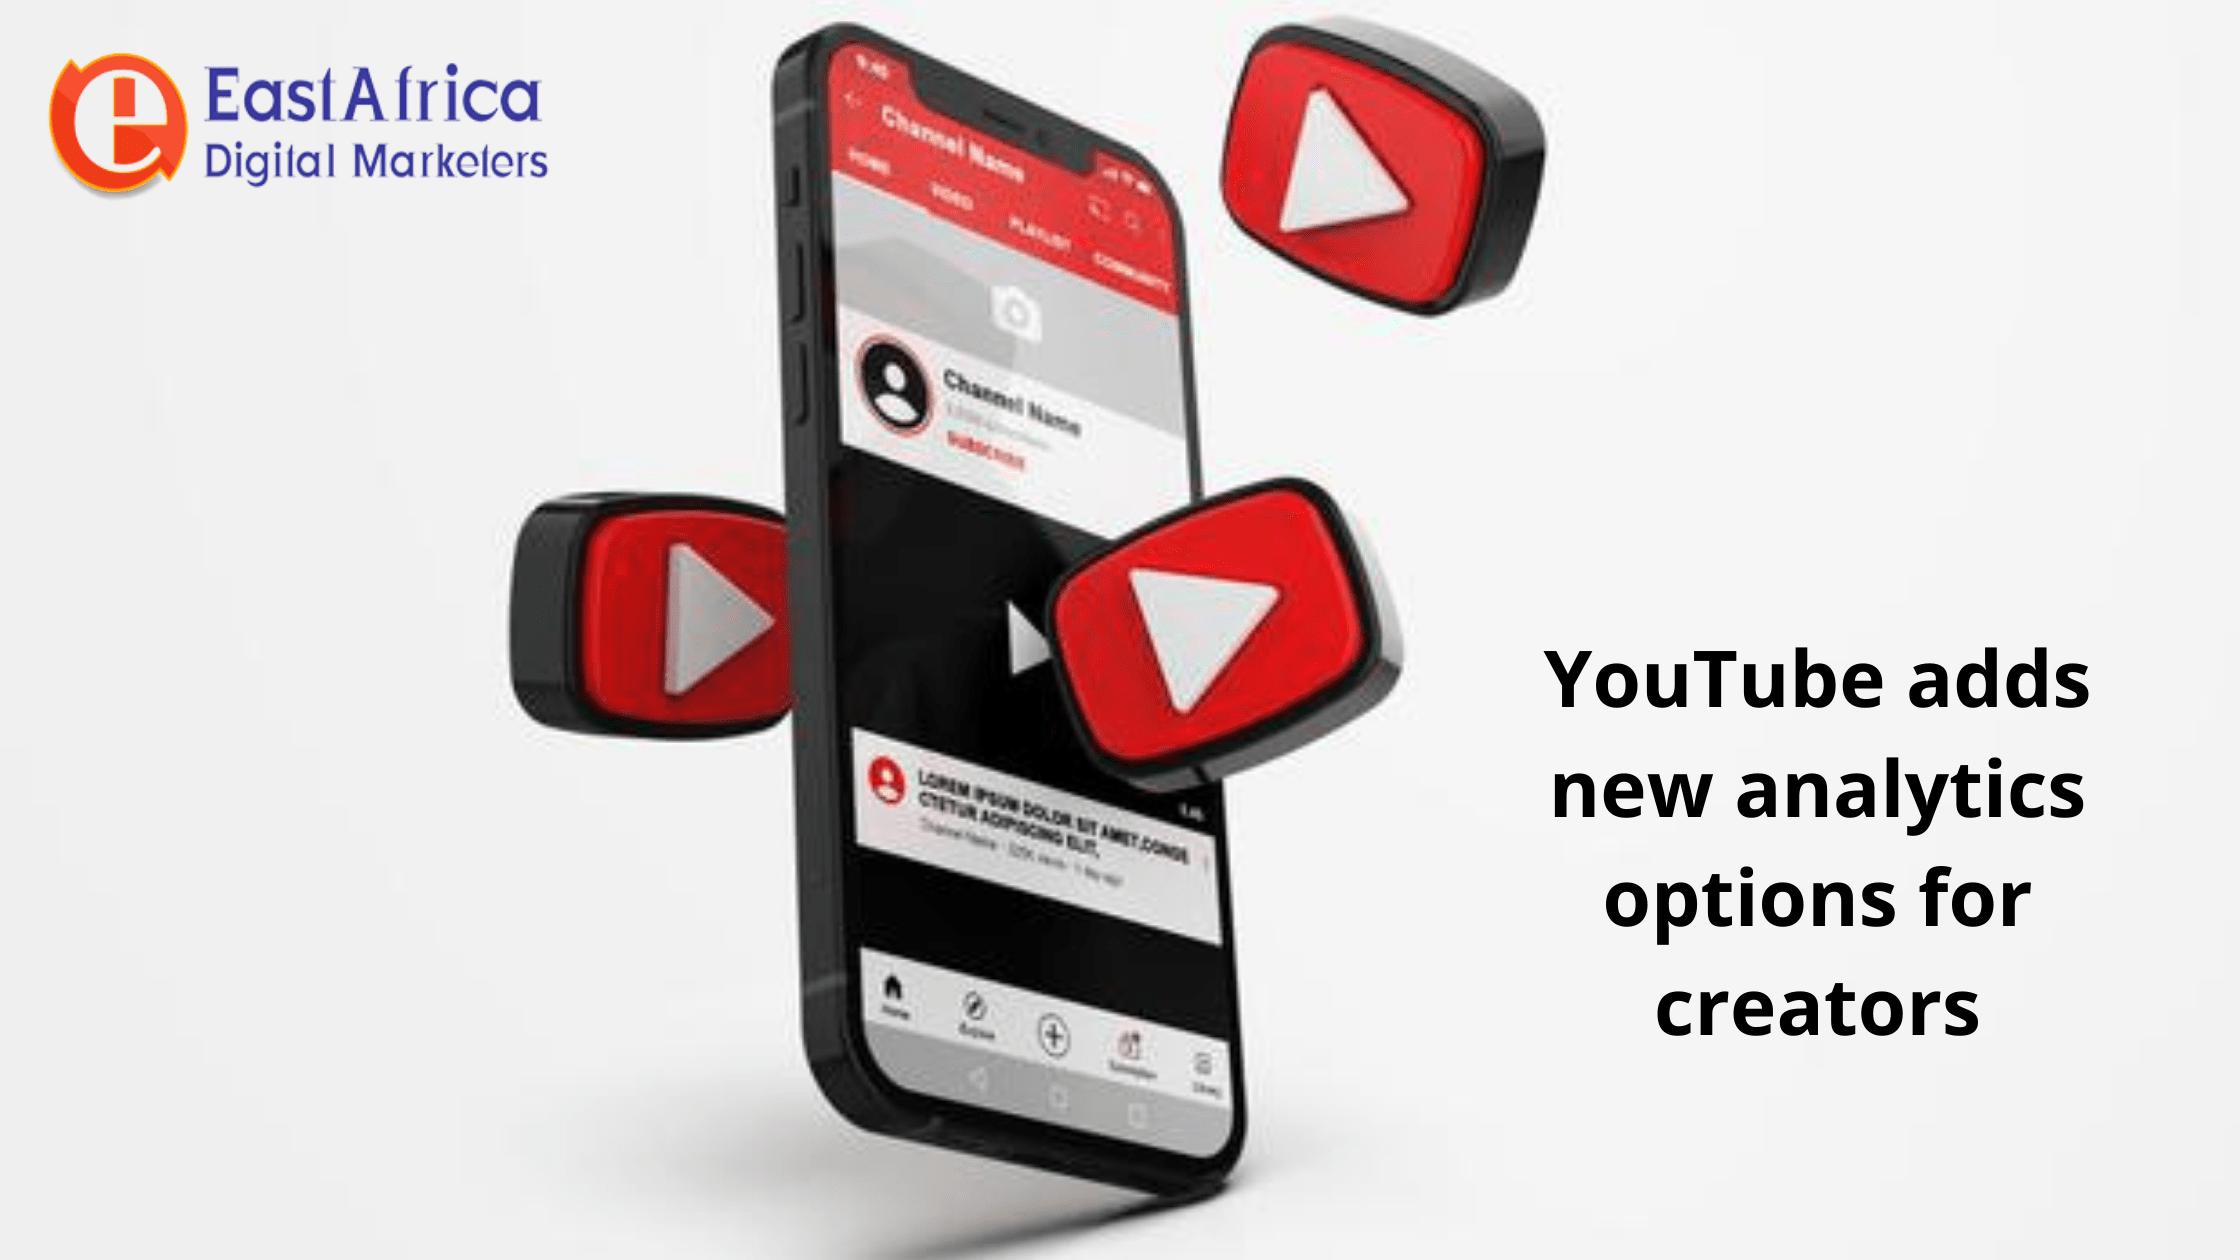 Youtube adds new analytics options for creators